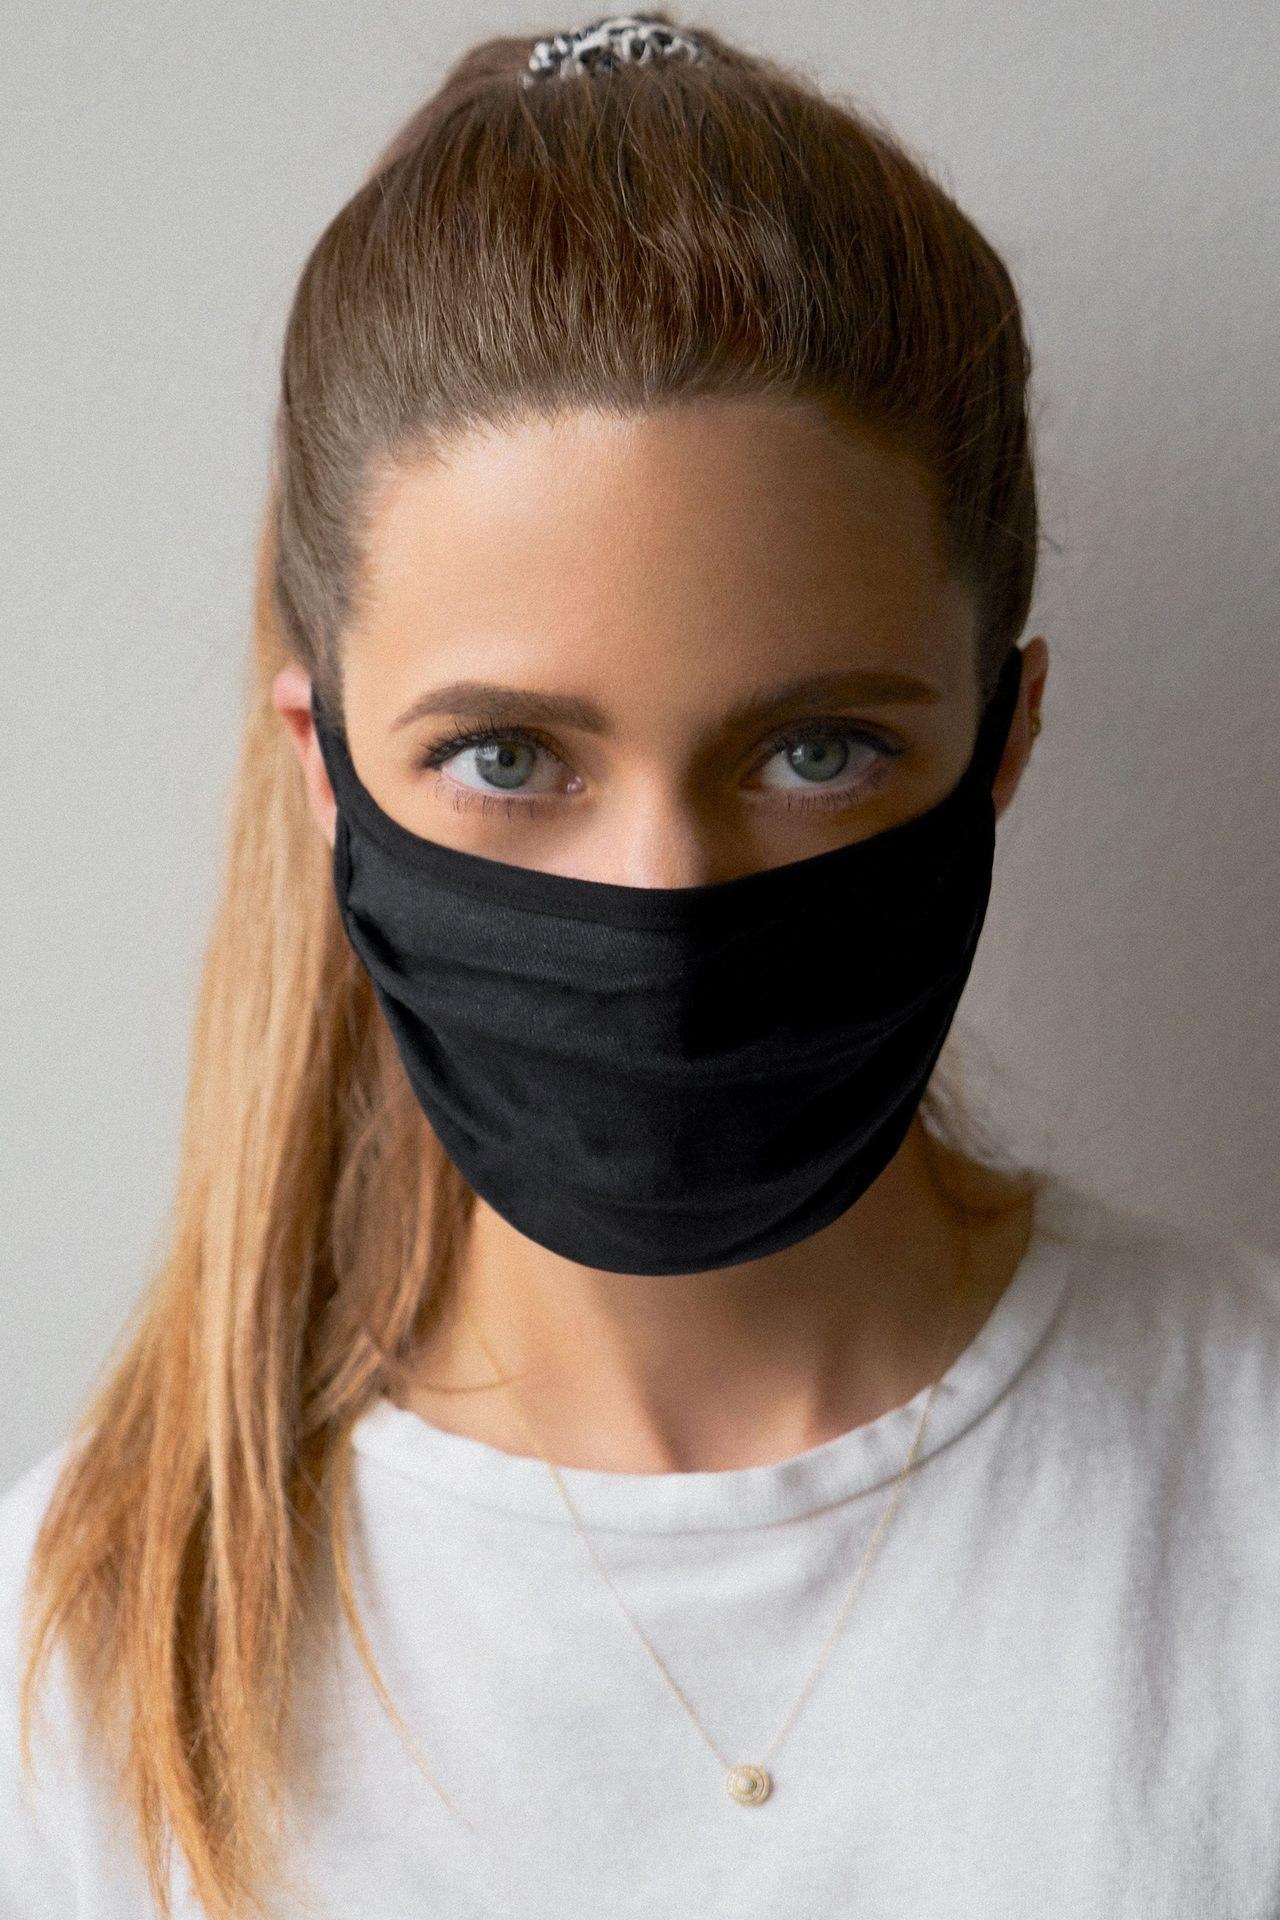 model wearing dark heather gray mask